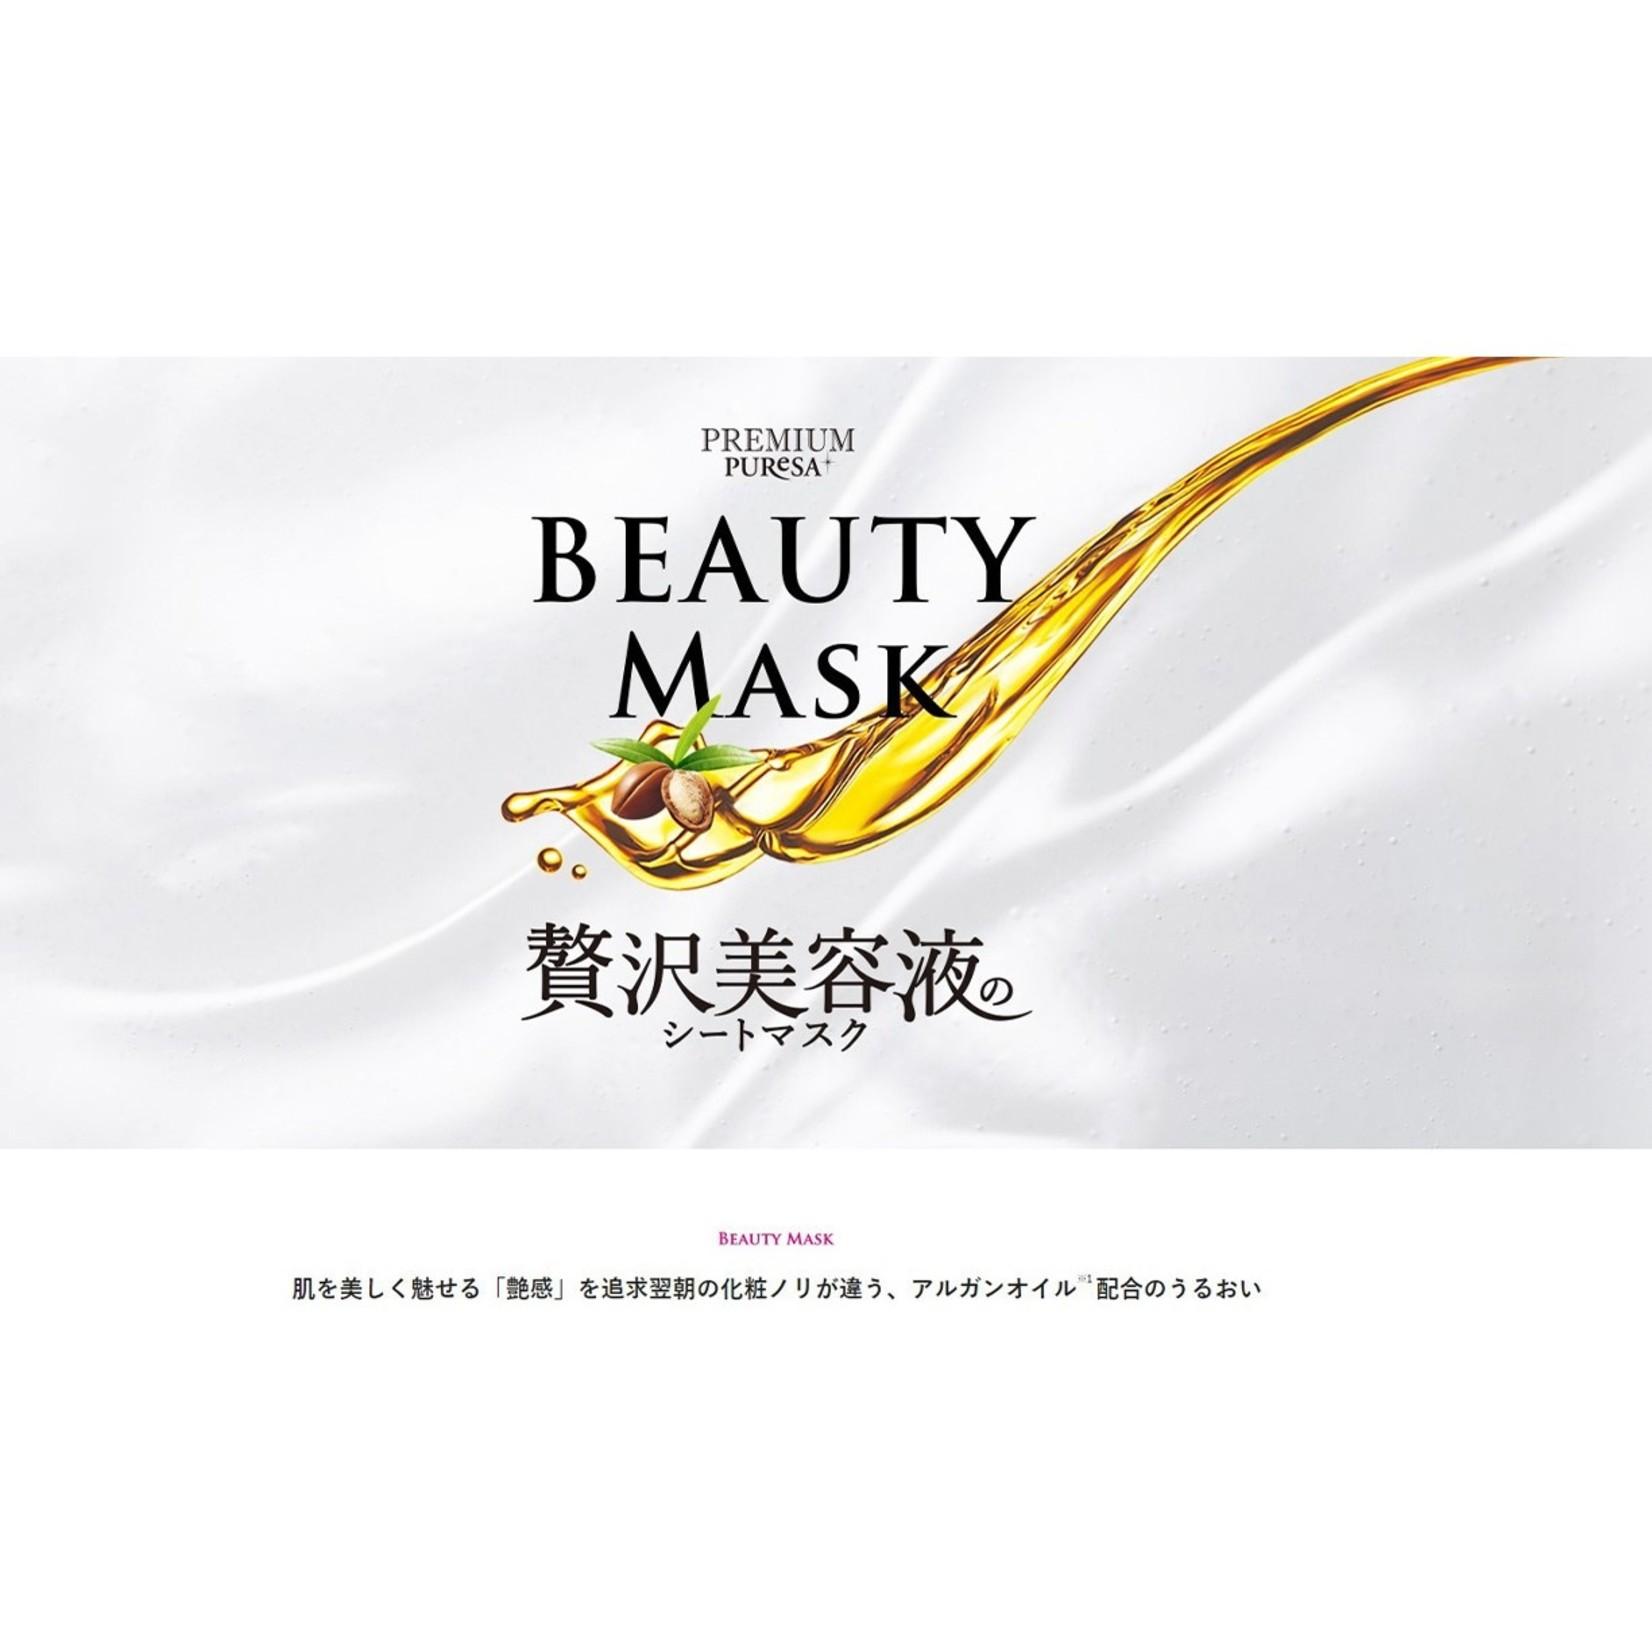 utena Premium Puresa Ceramide Beauty Mask (4 Stk)